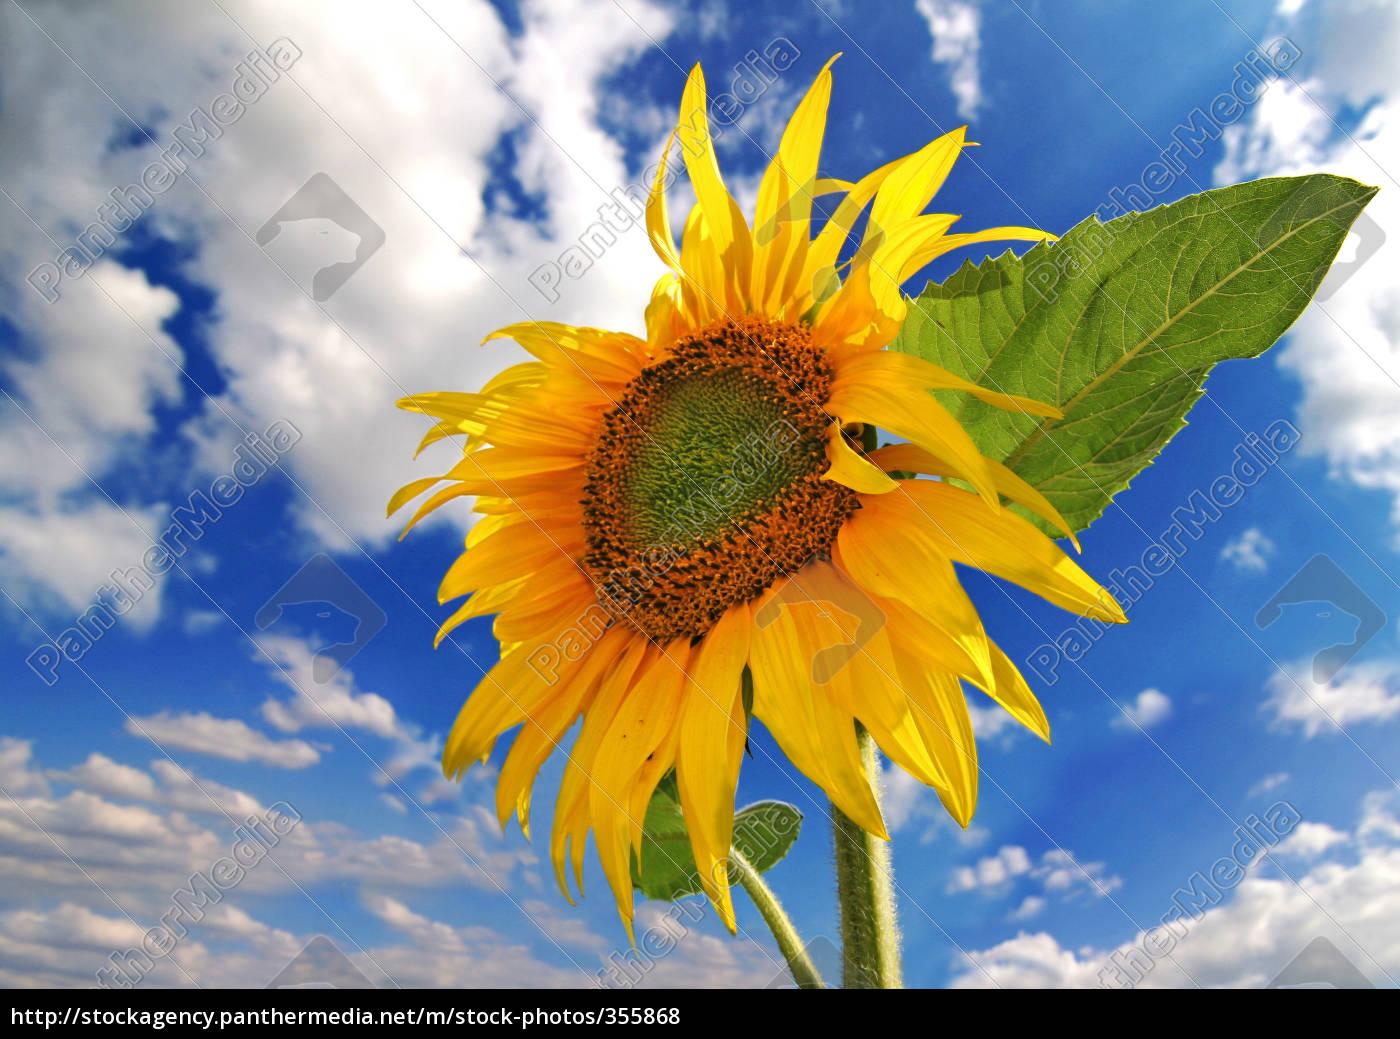 sunflower - 355868